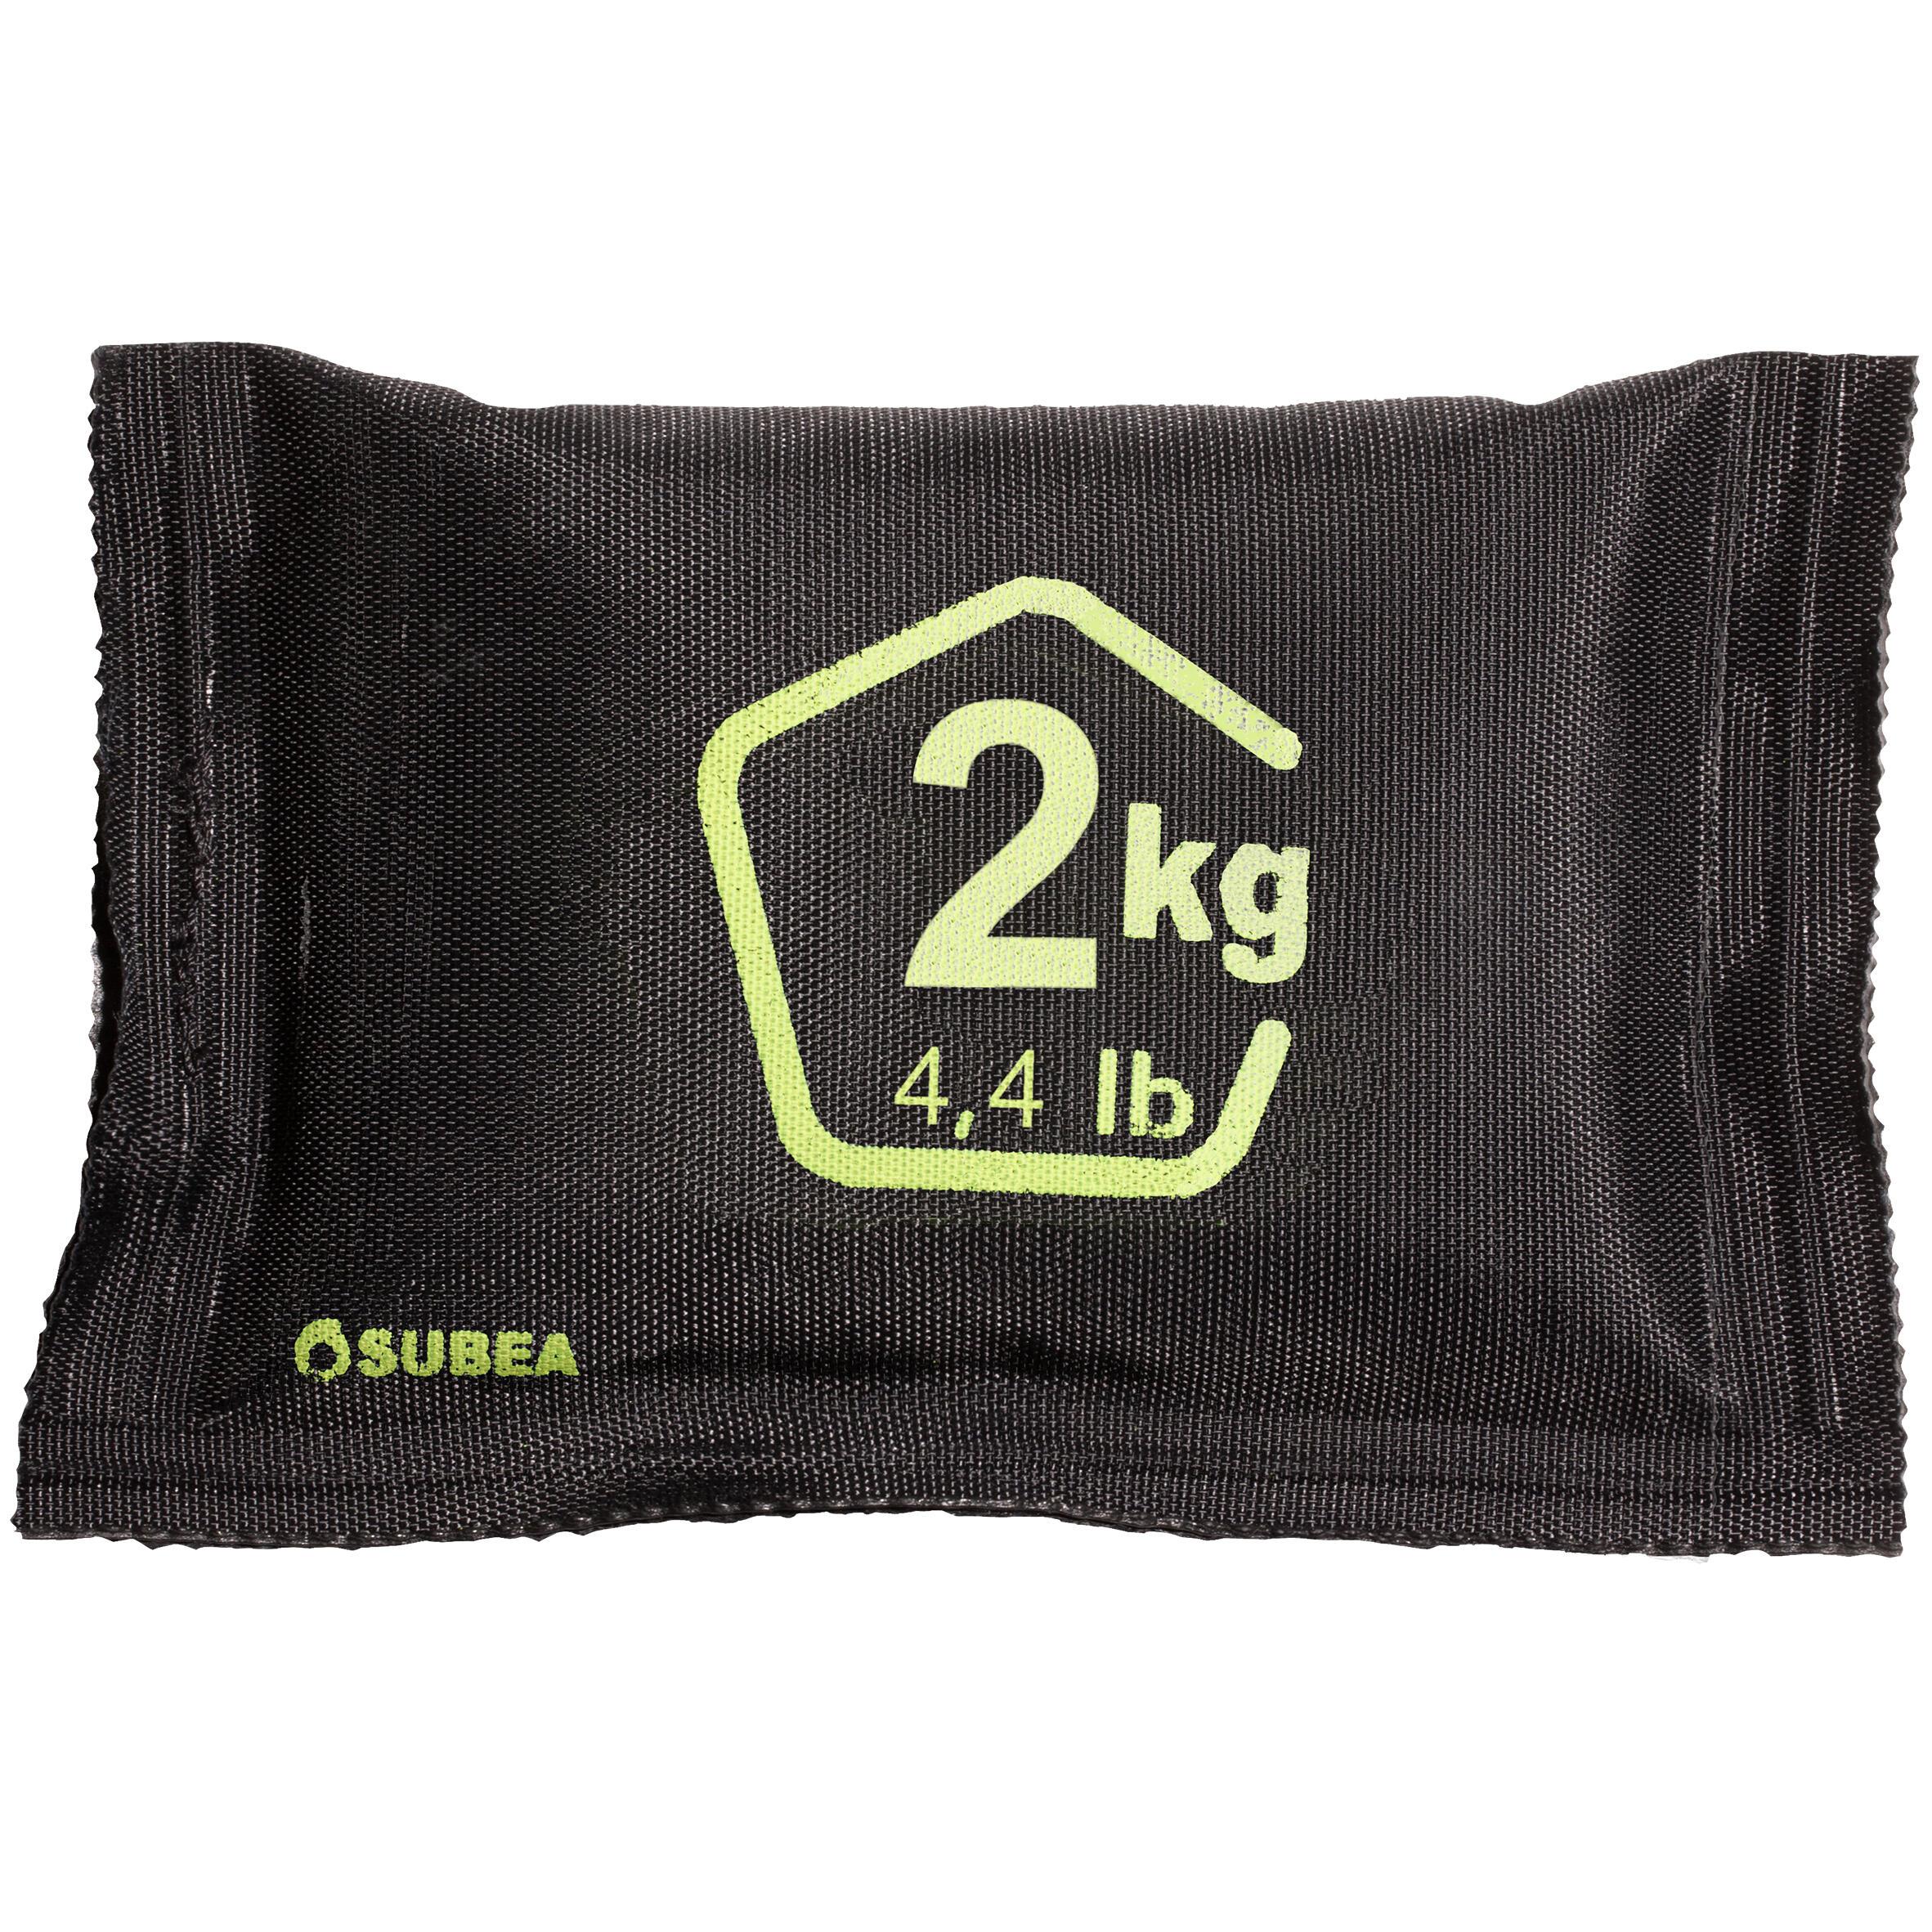 Subea Loodzakjes voor duiken 2 kg